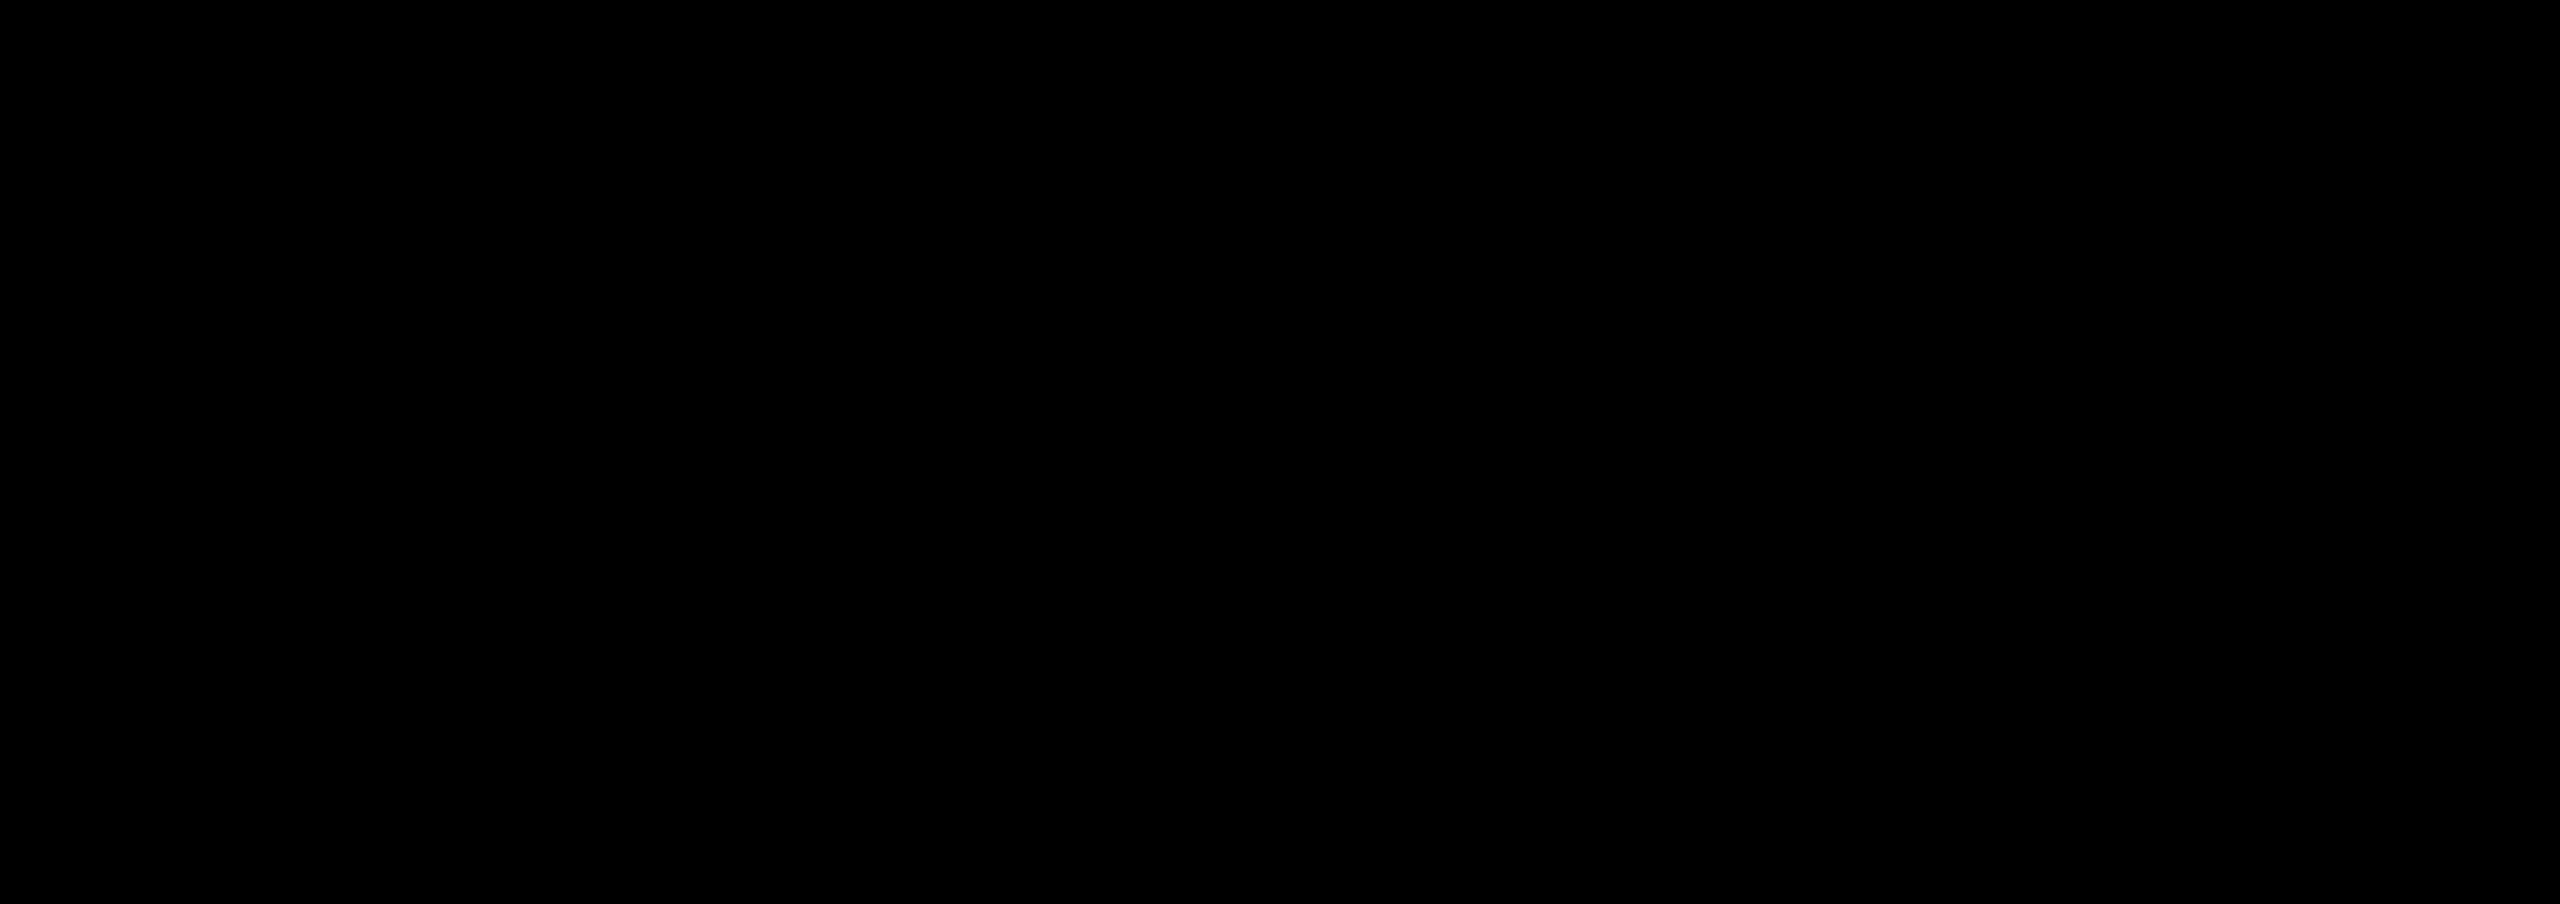 maine-the-mag-logo